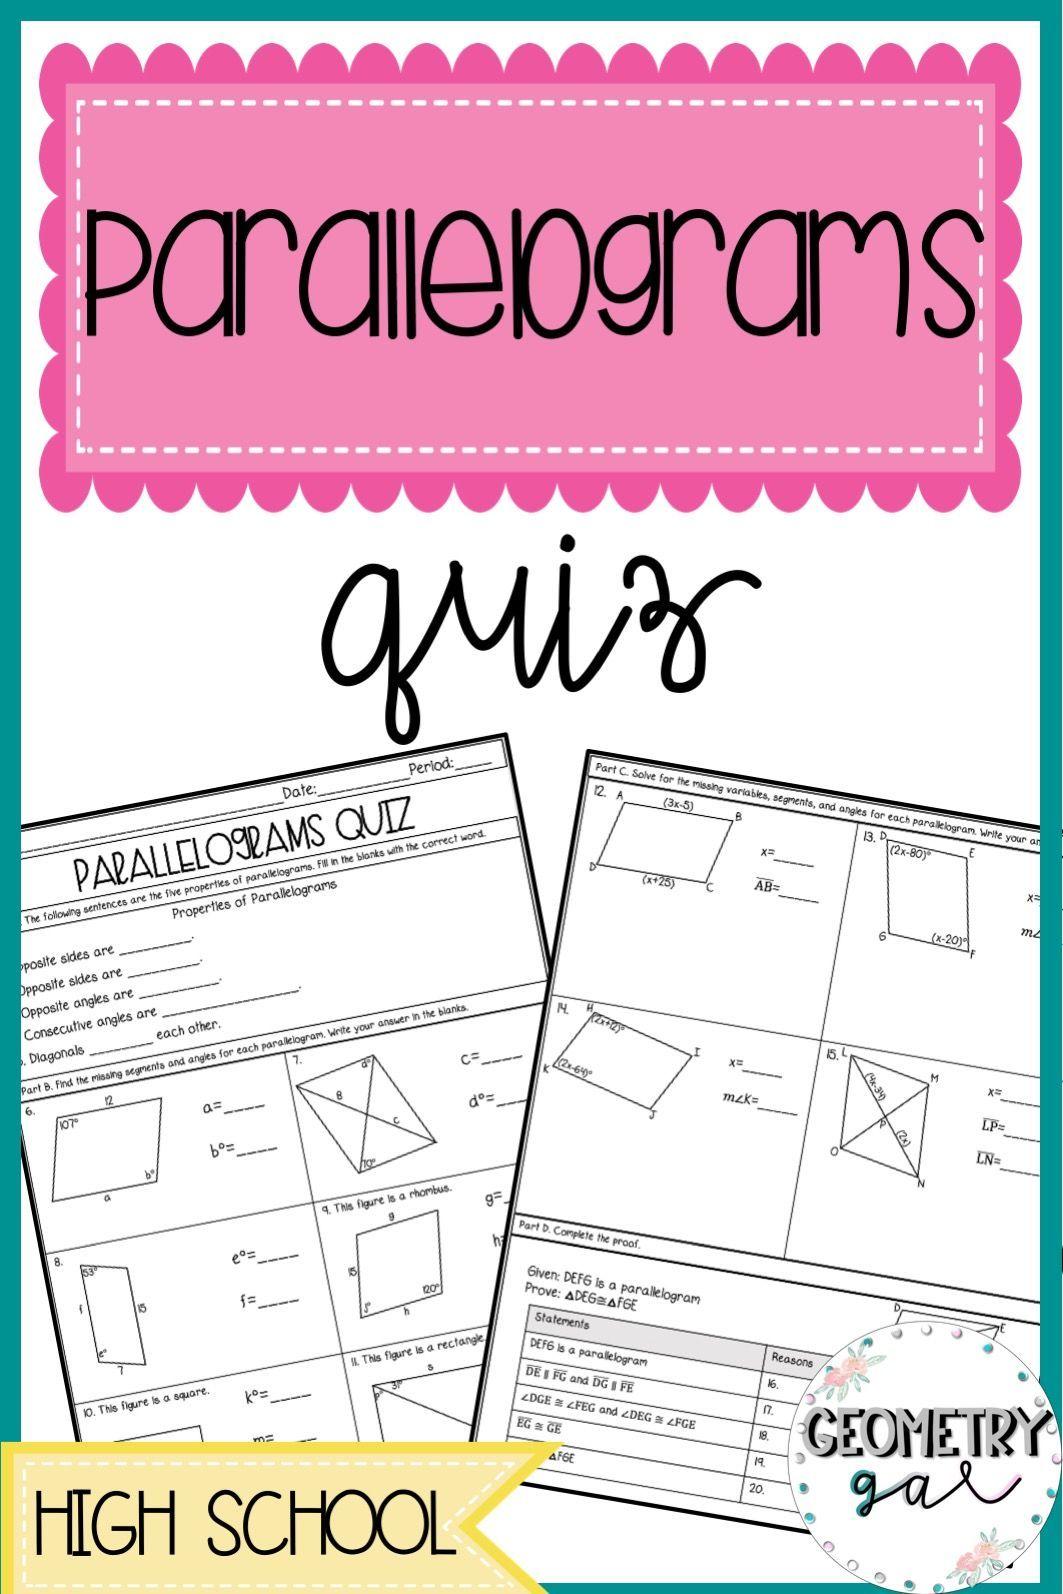 Parallelograms Quiz